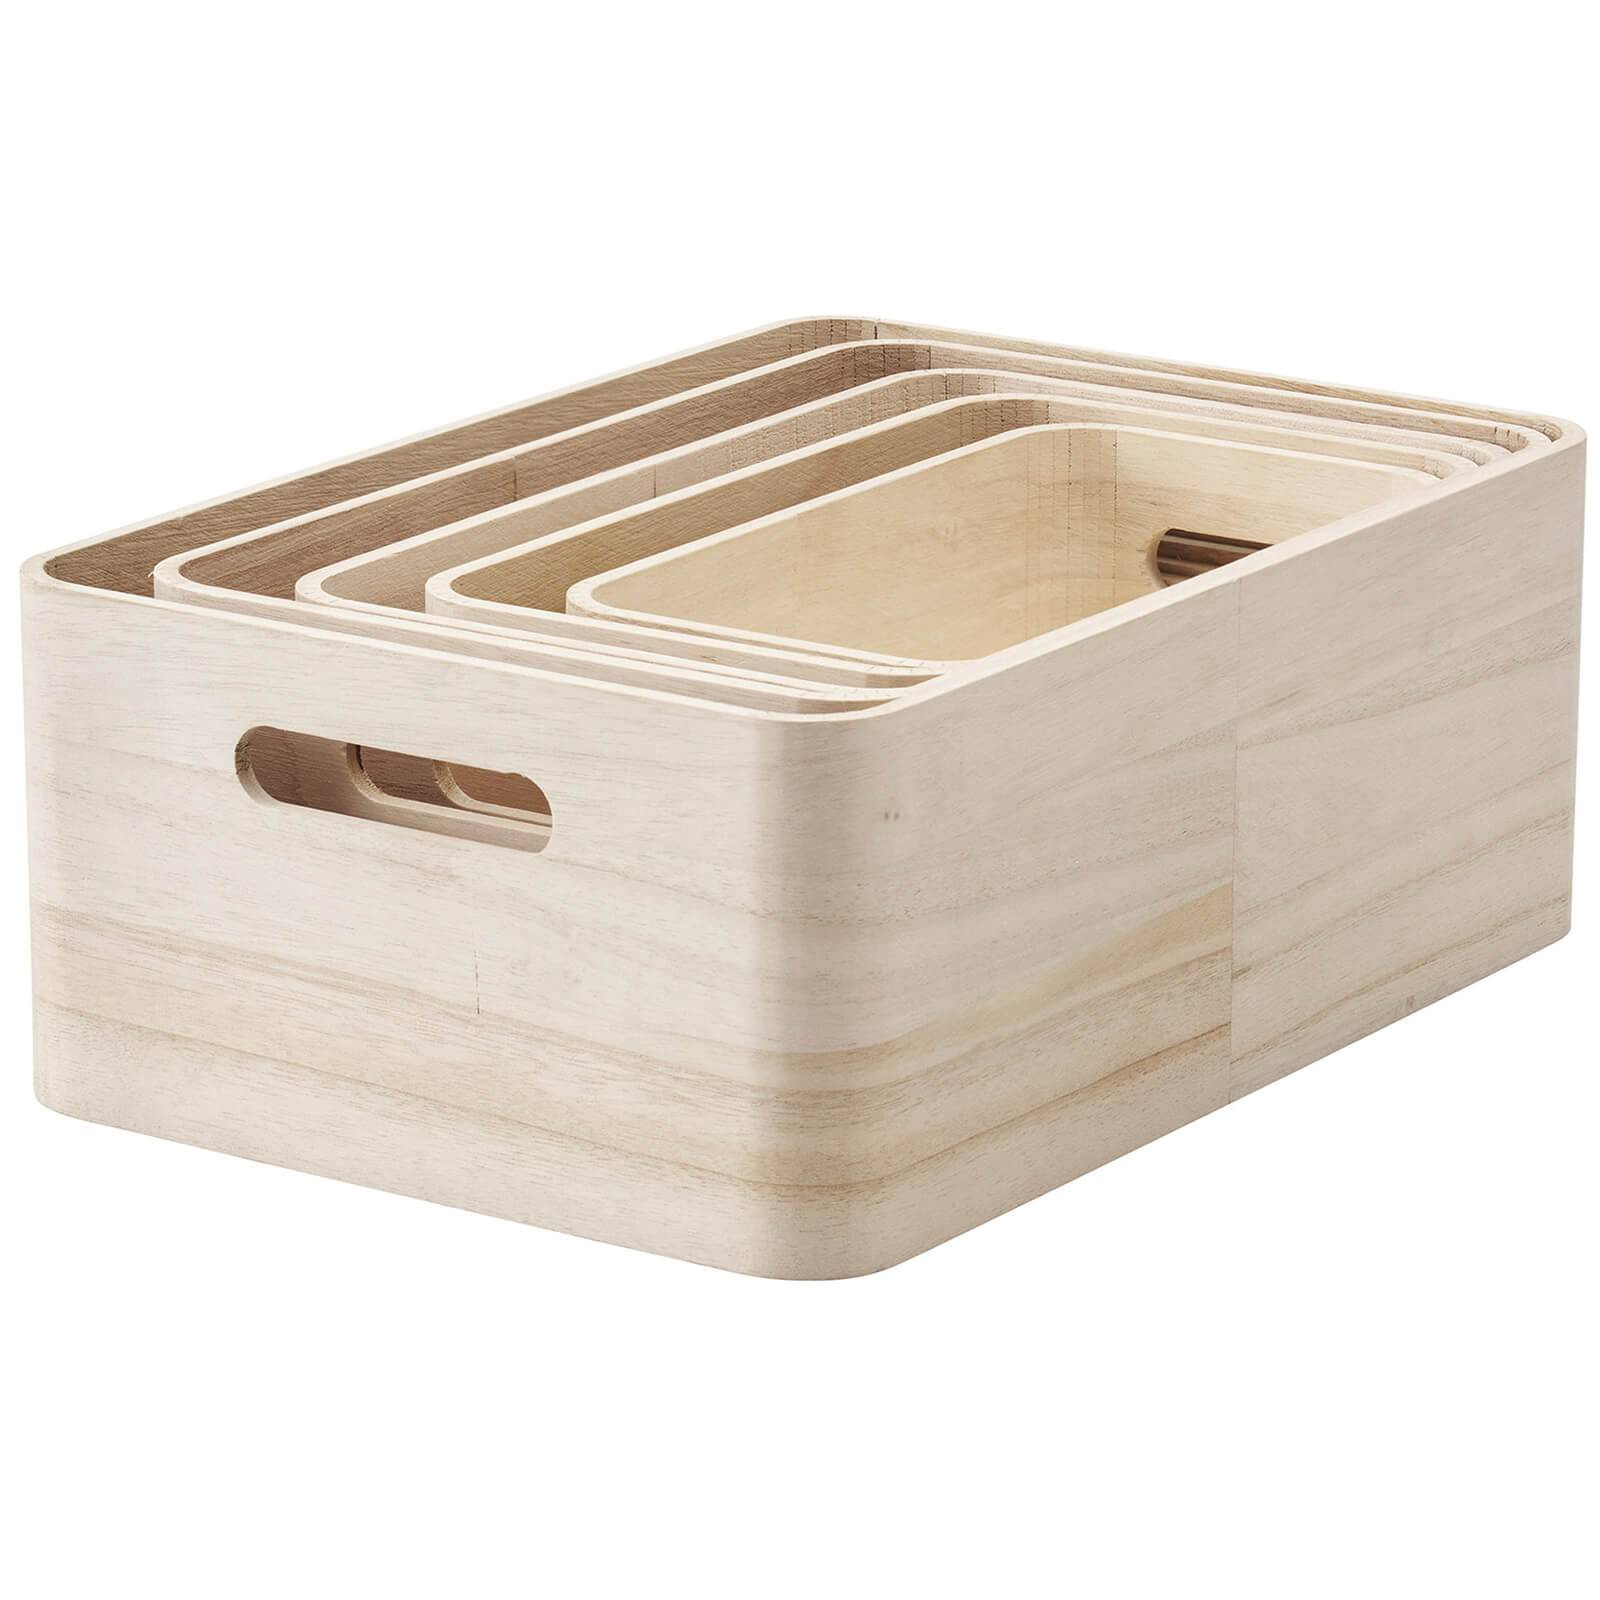 RIG-TIG Save-It Storage Boxes - Set of 5